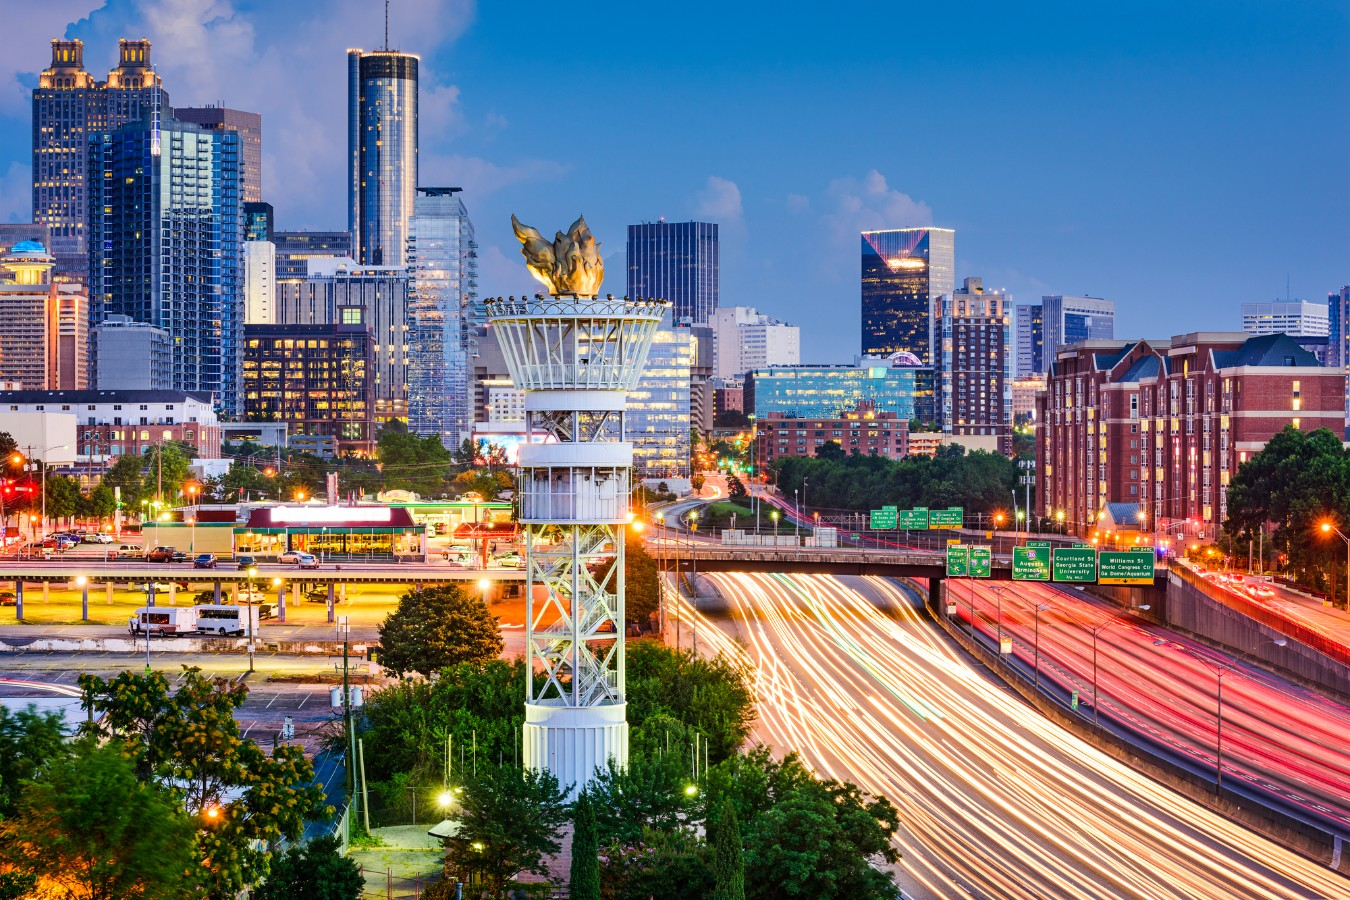 Top 20 Atlanta Real Estate Agents On Social Media In 2018